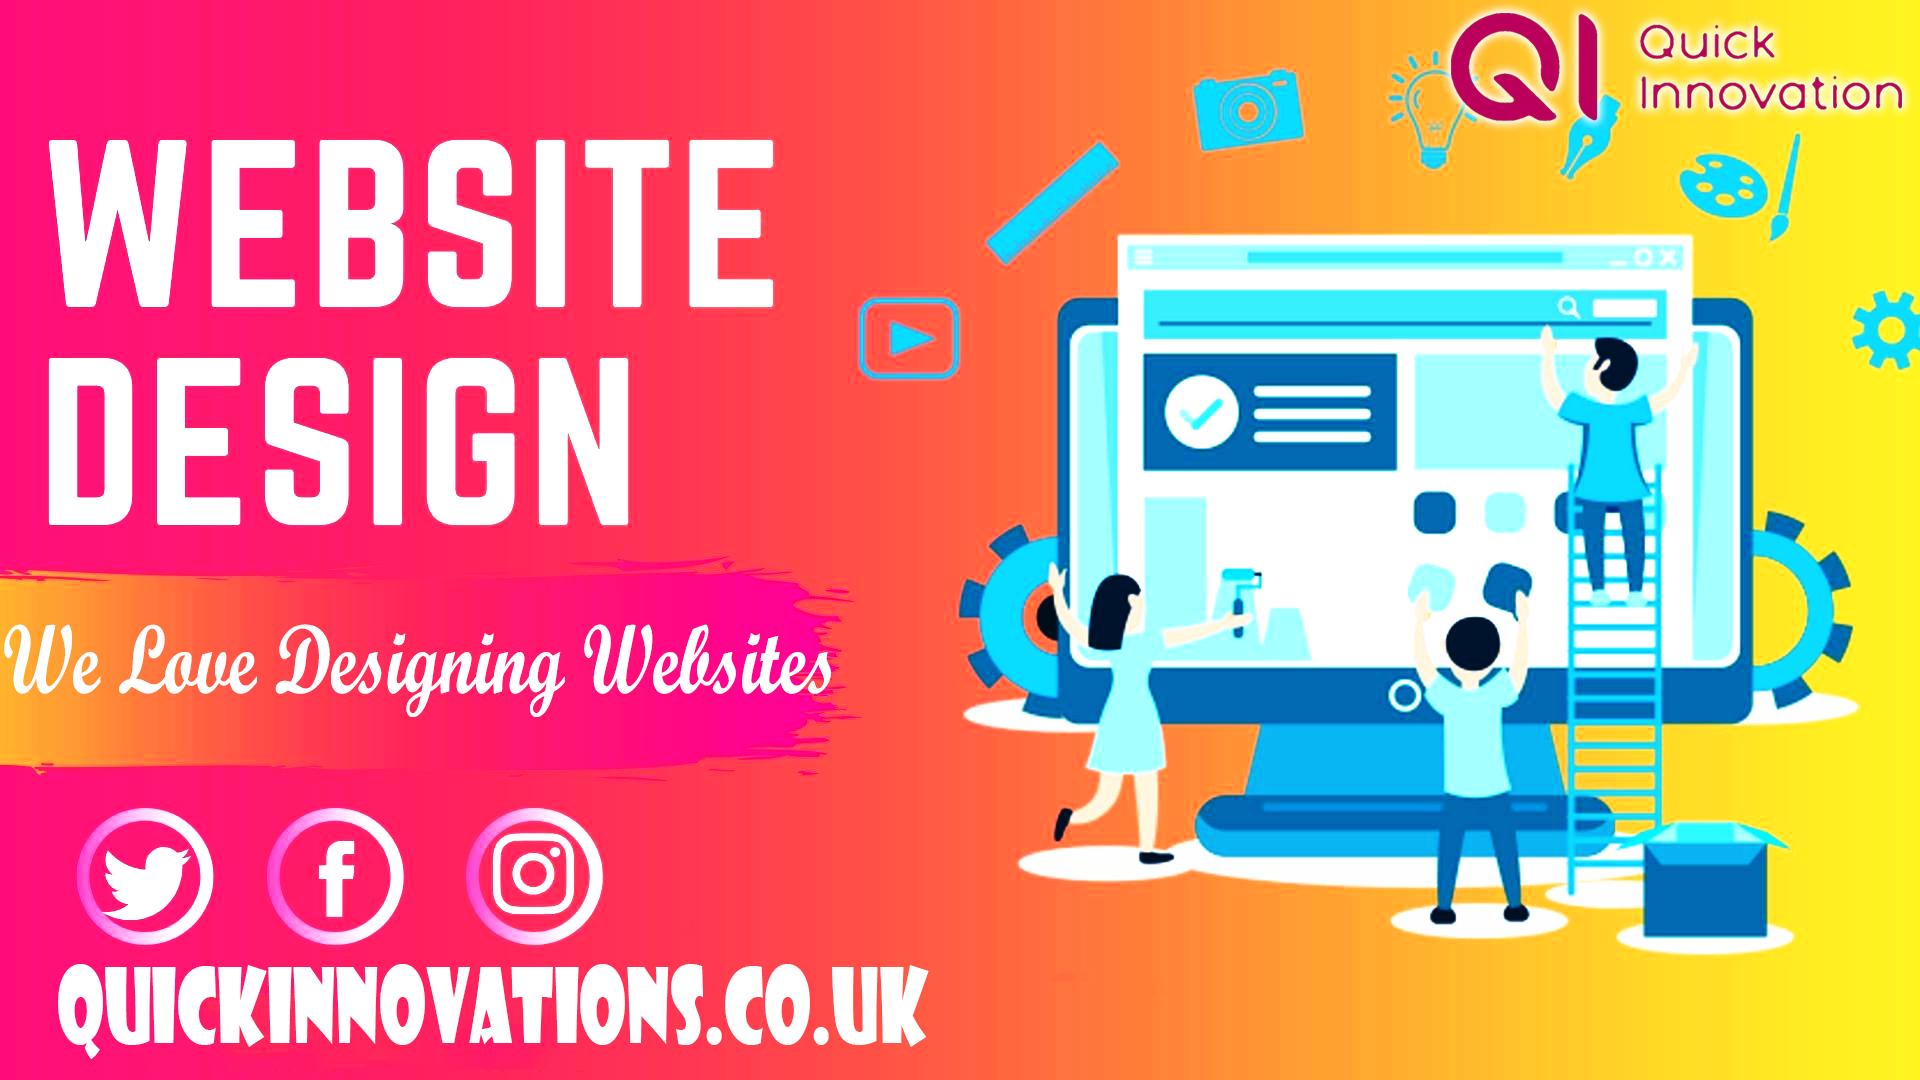 Web Design London In 2020 Web Design London Unique Web Design Web Design Services